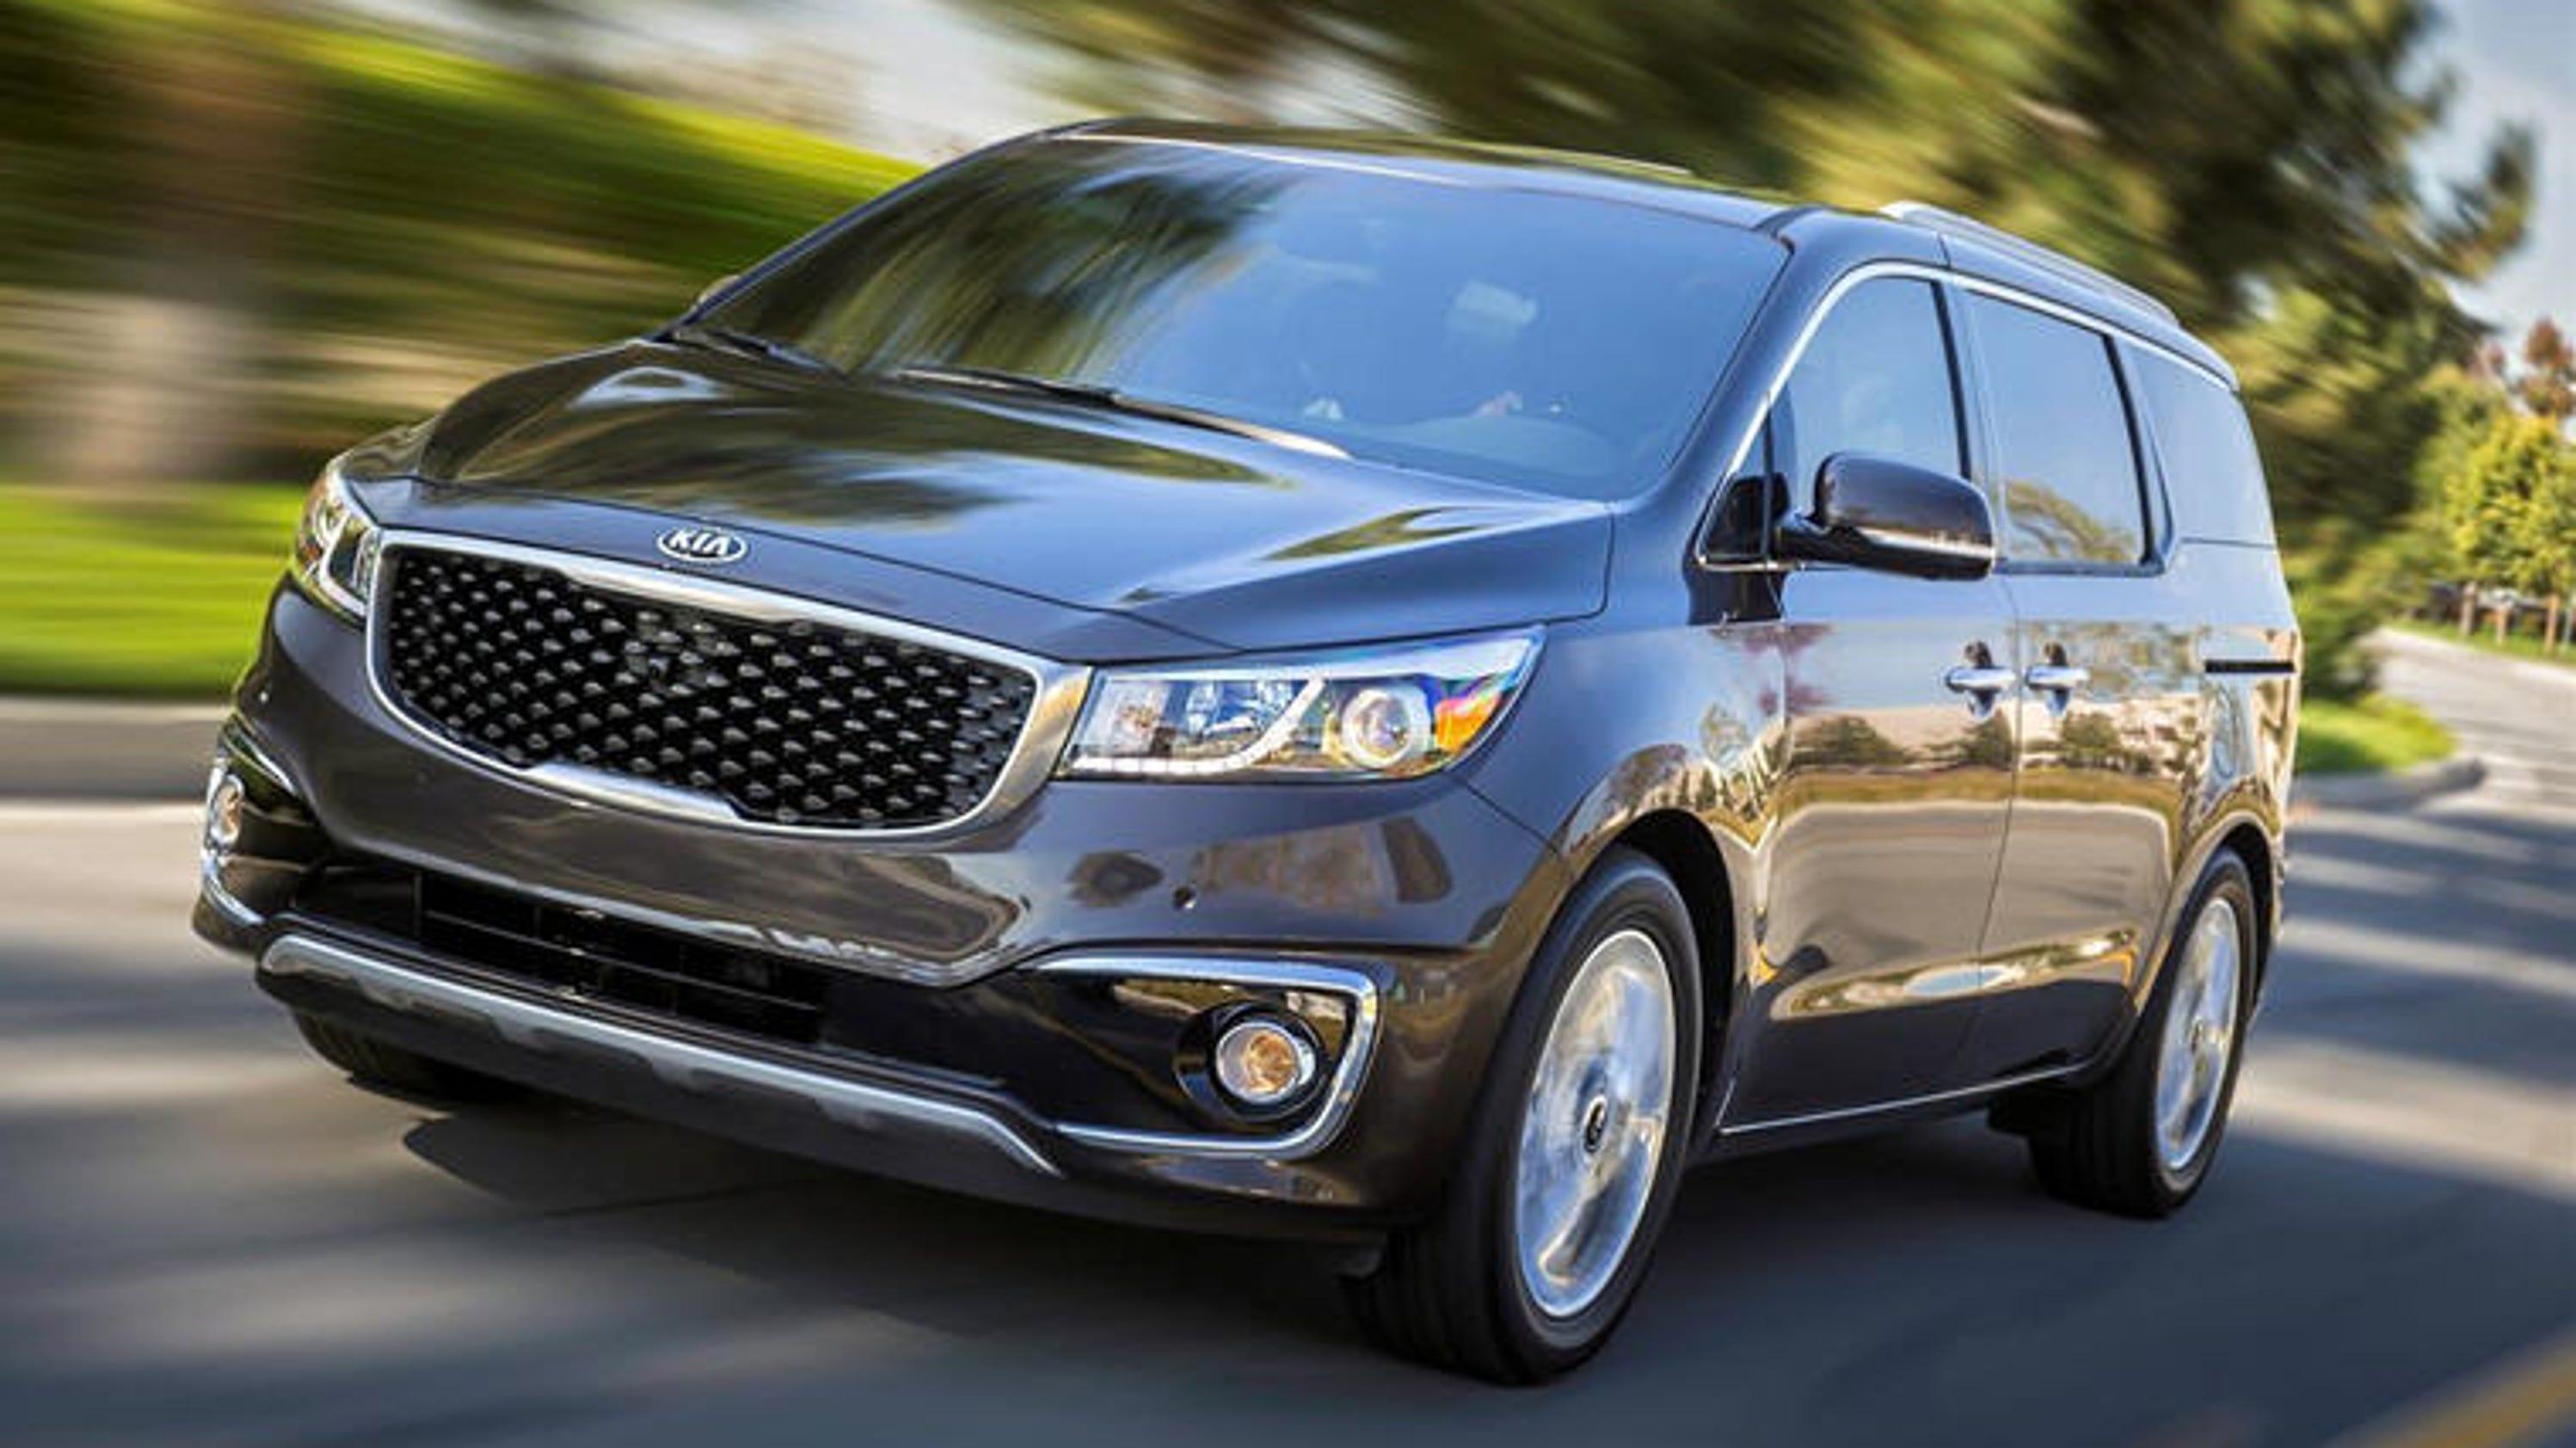 sliding recall ex recalls for sedona problem story cars minivans minivan door kia money